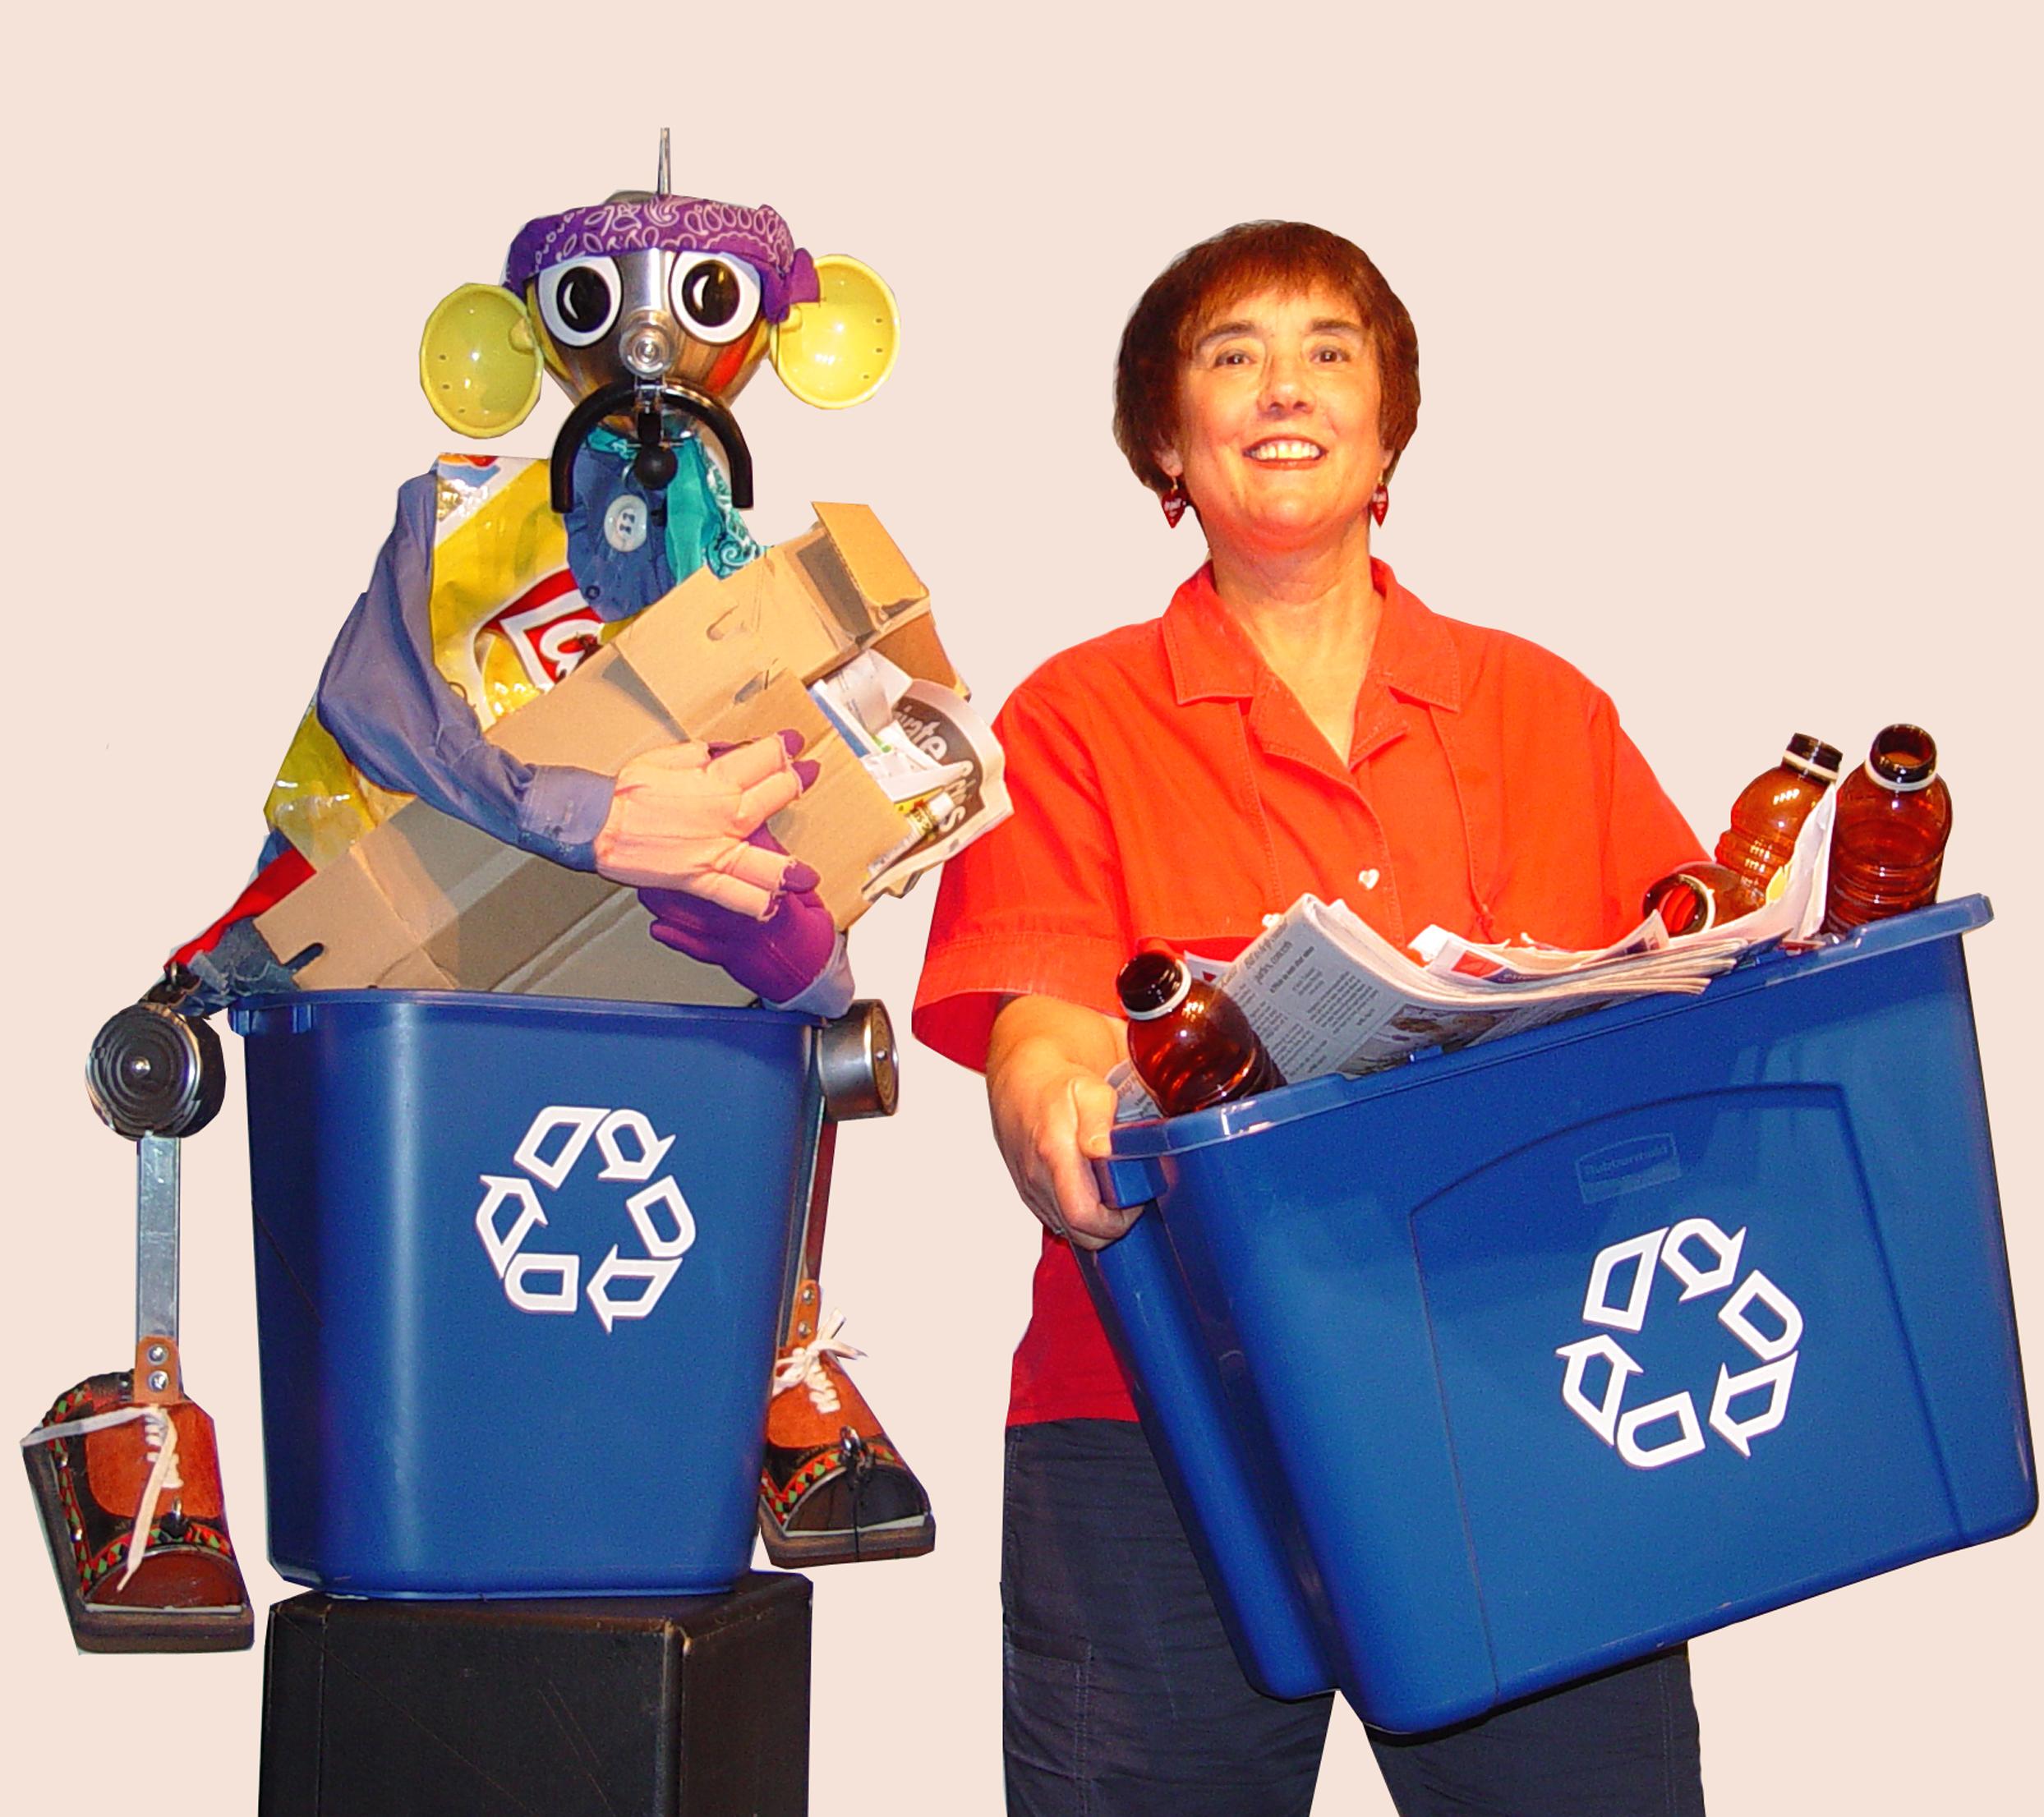 DinoRock Junkyard Pirates – Recycling Everywhere